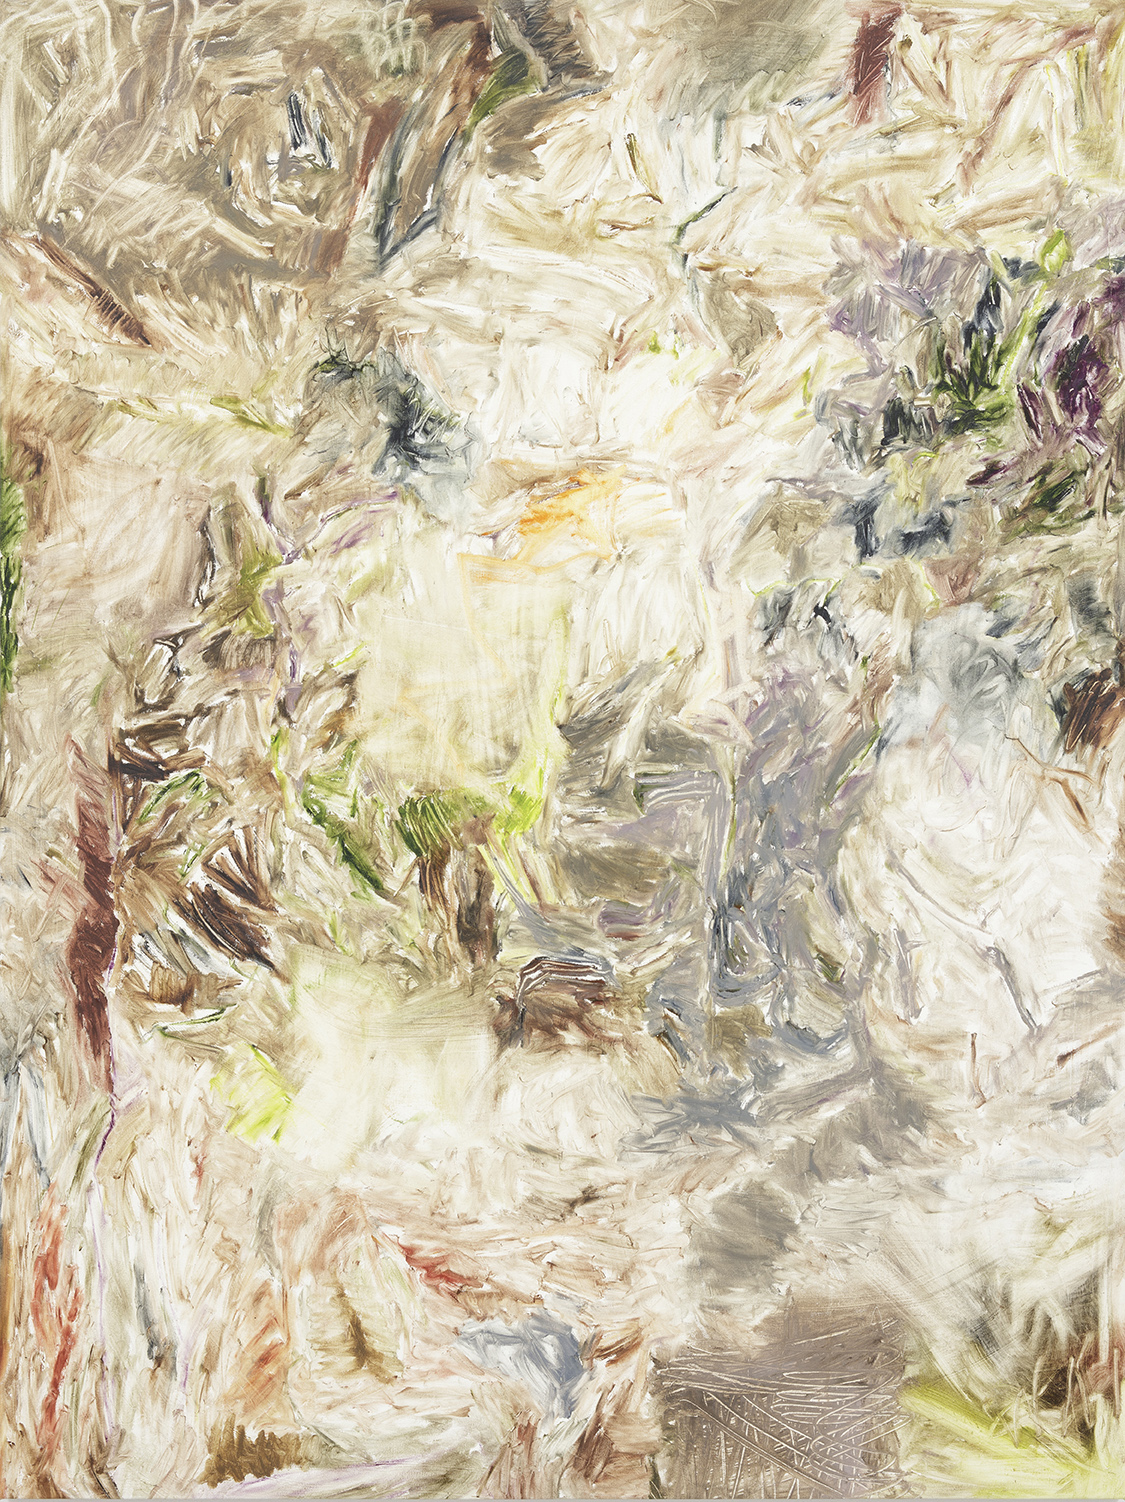 Joaquin Boz. <em>Untitled</em>, 2018. Oil on canvas, 75 1/2 x 56 1/2 inches (191.8 x 143.5 cm)